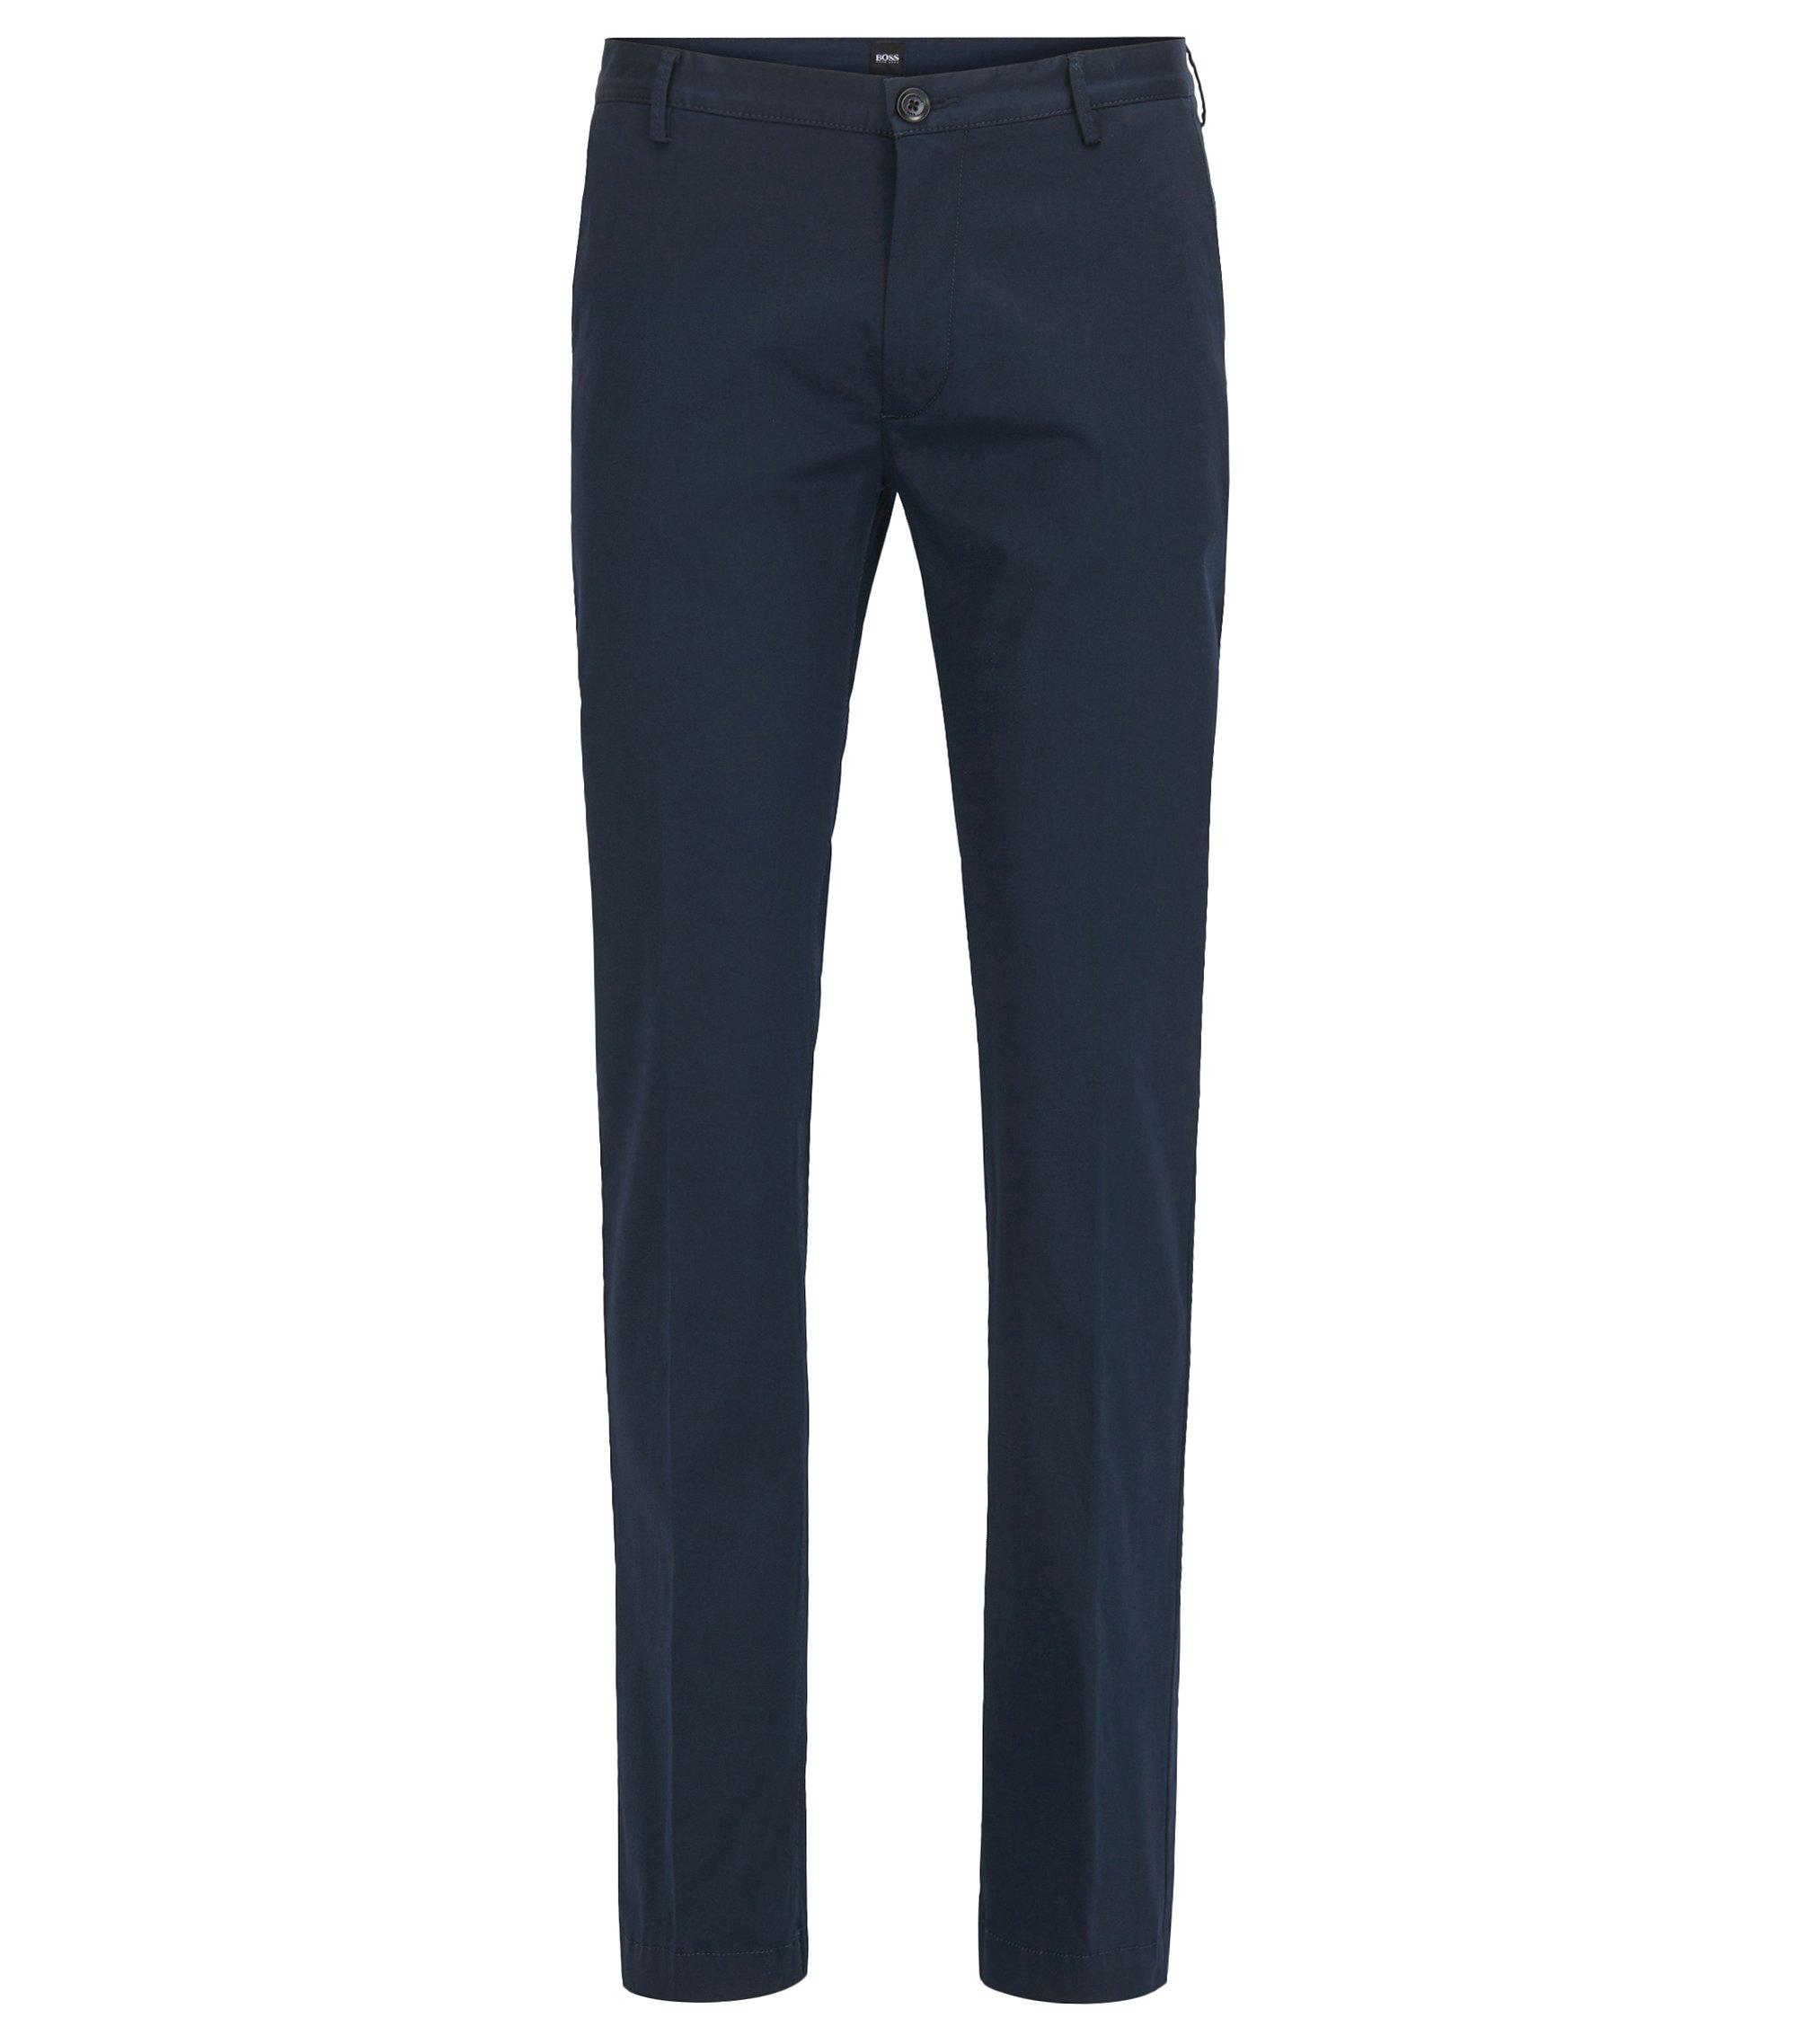 Chino Slim Fit en coton stretch mercerisé, Bleu foncé